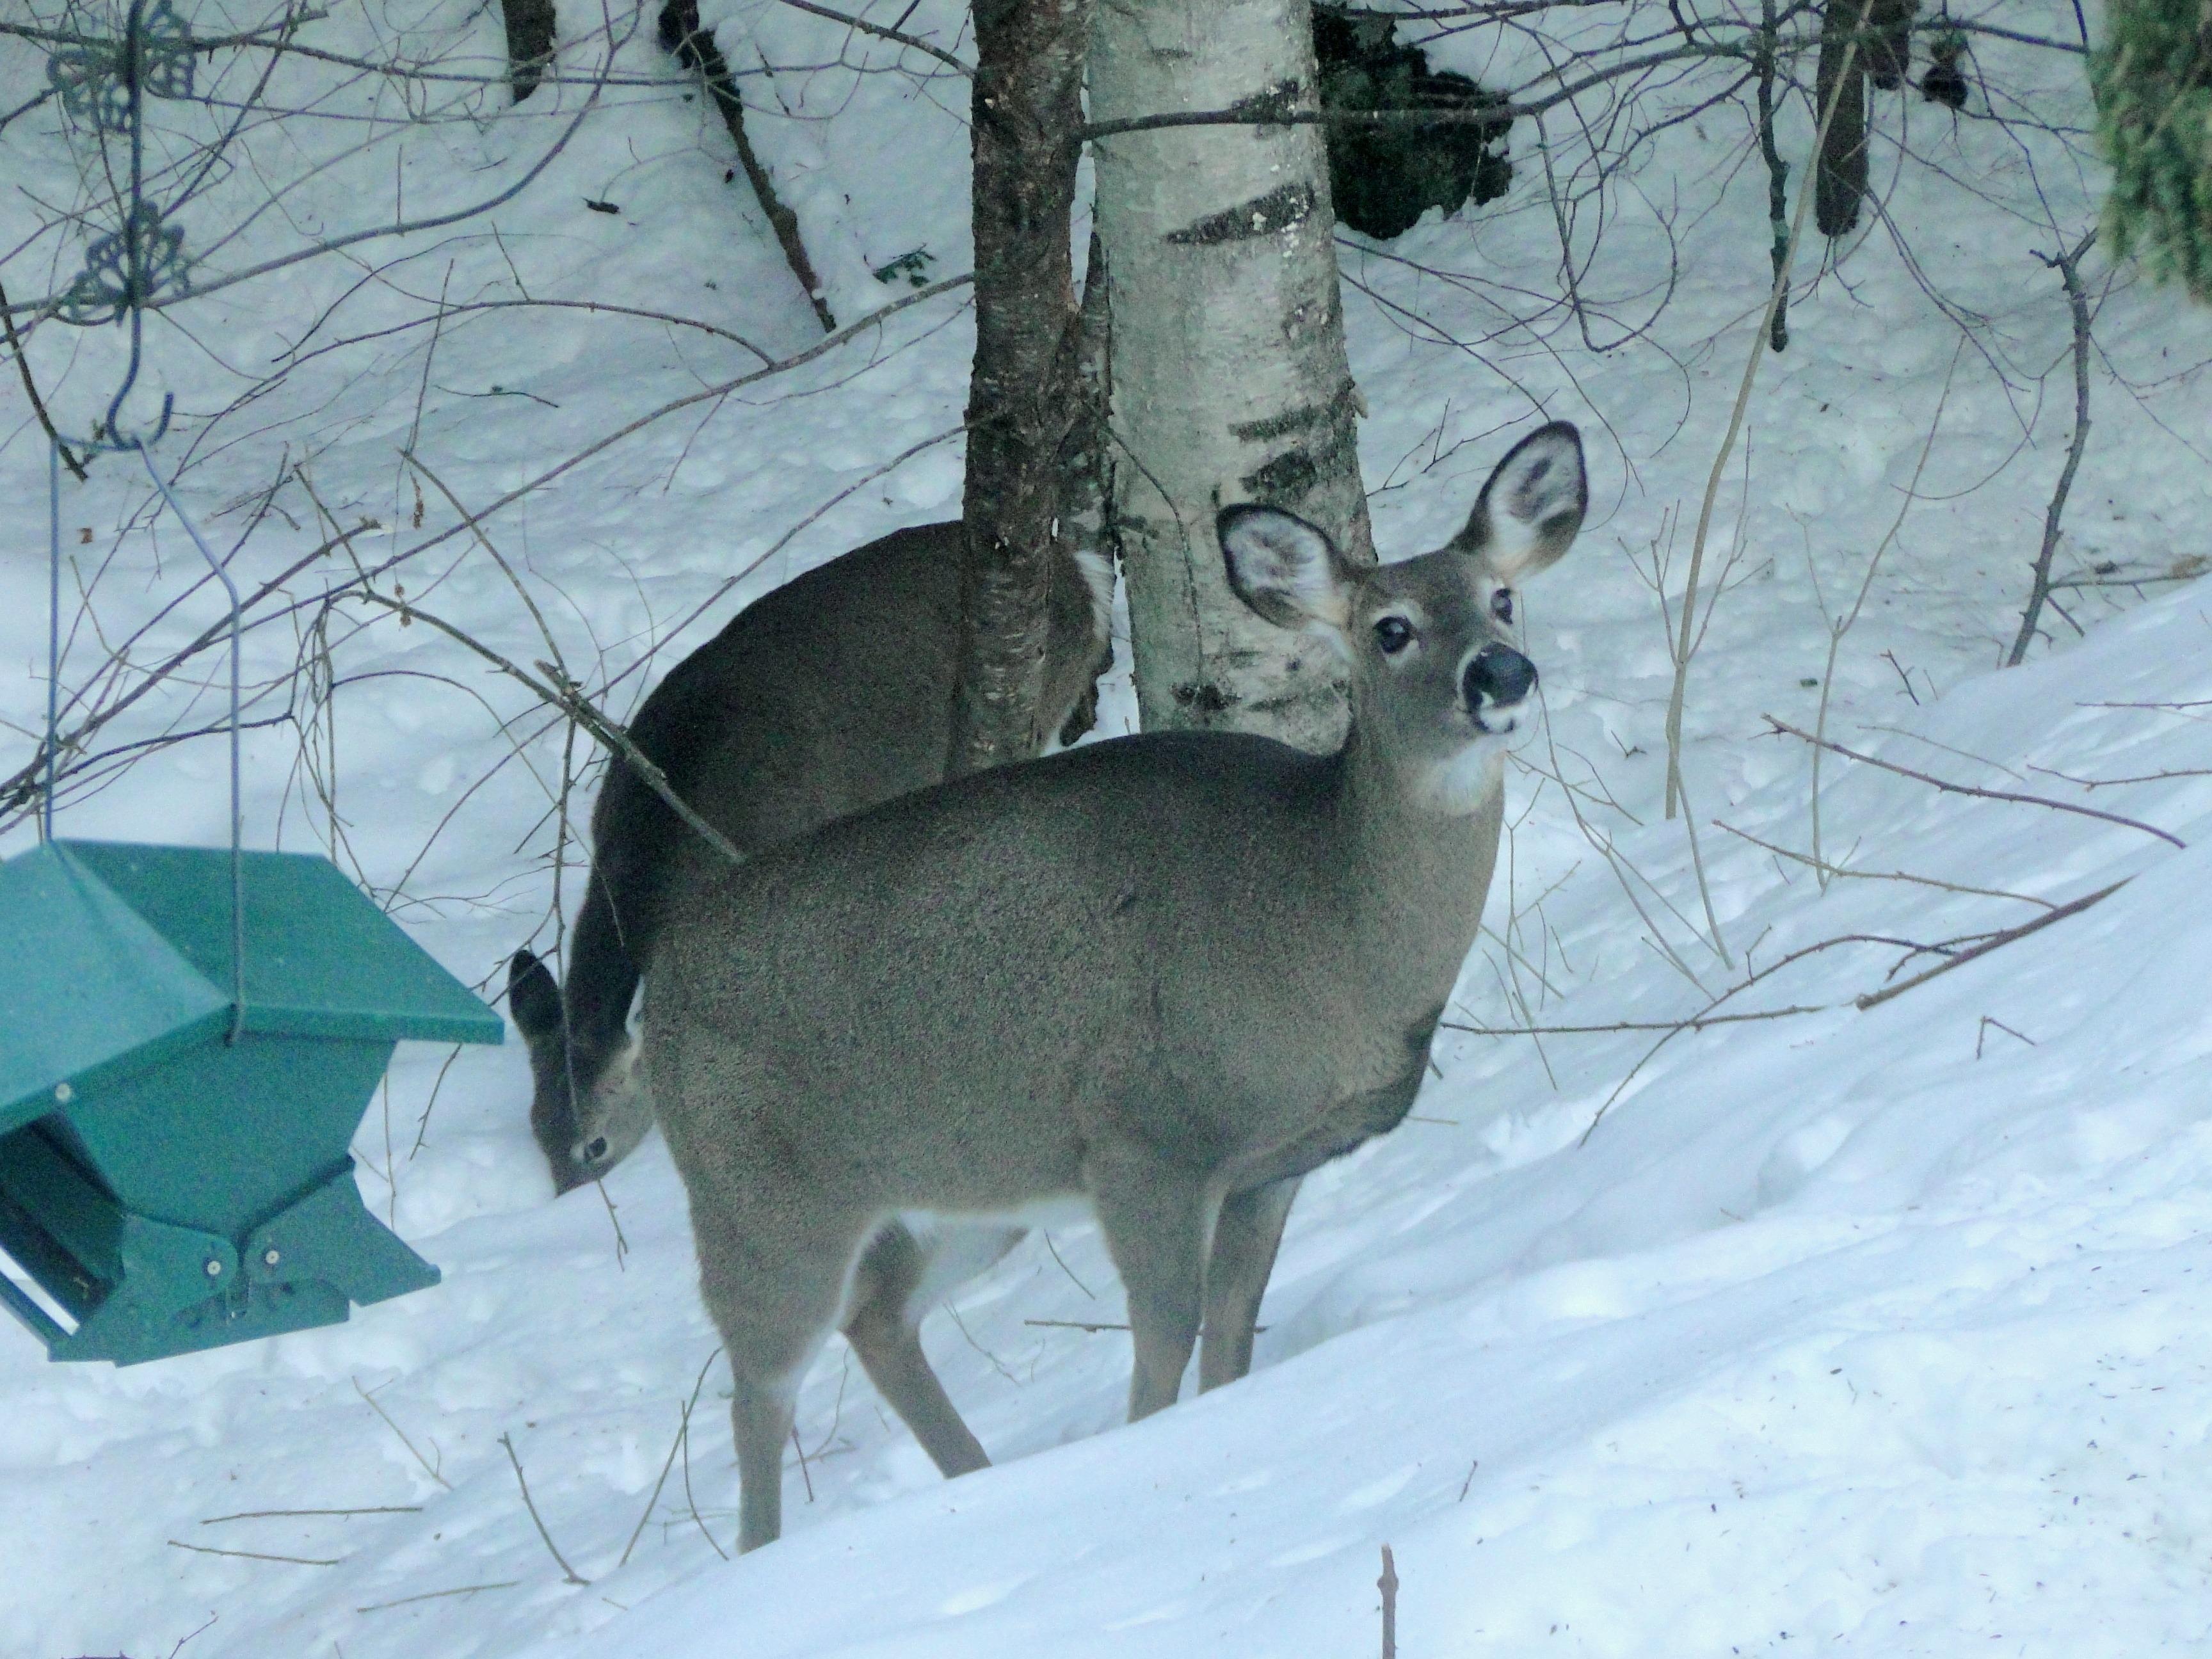 free images nature snow winter wildlife backyard mammal